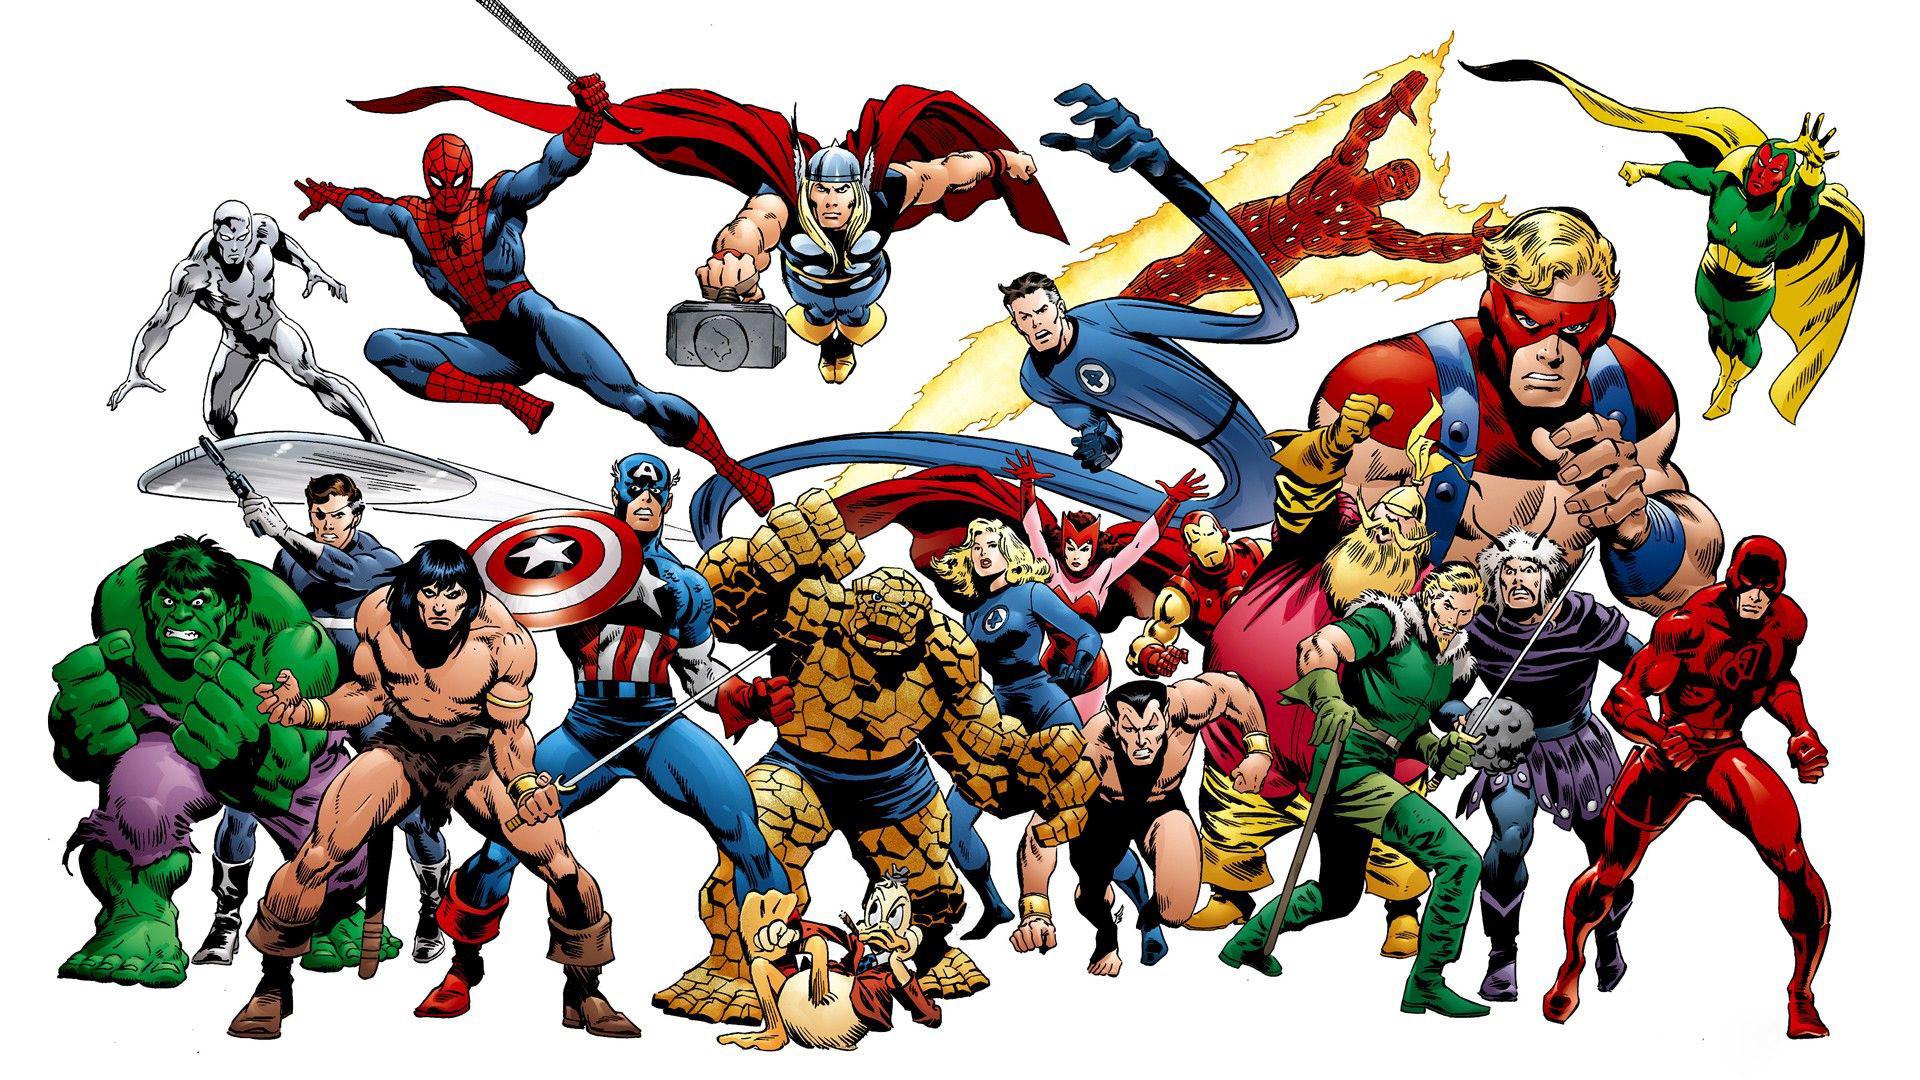 Marvel superheroes wallpaper 62 images - All marvel heroes wallpaper ...